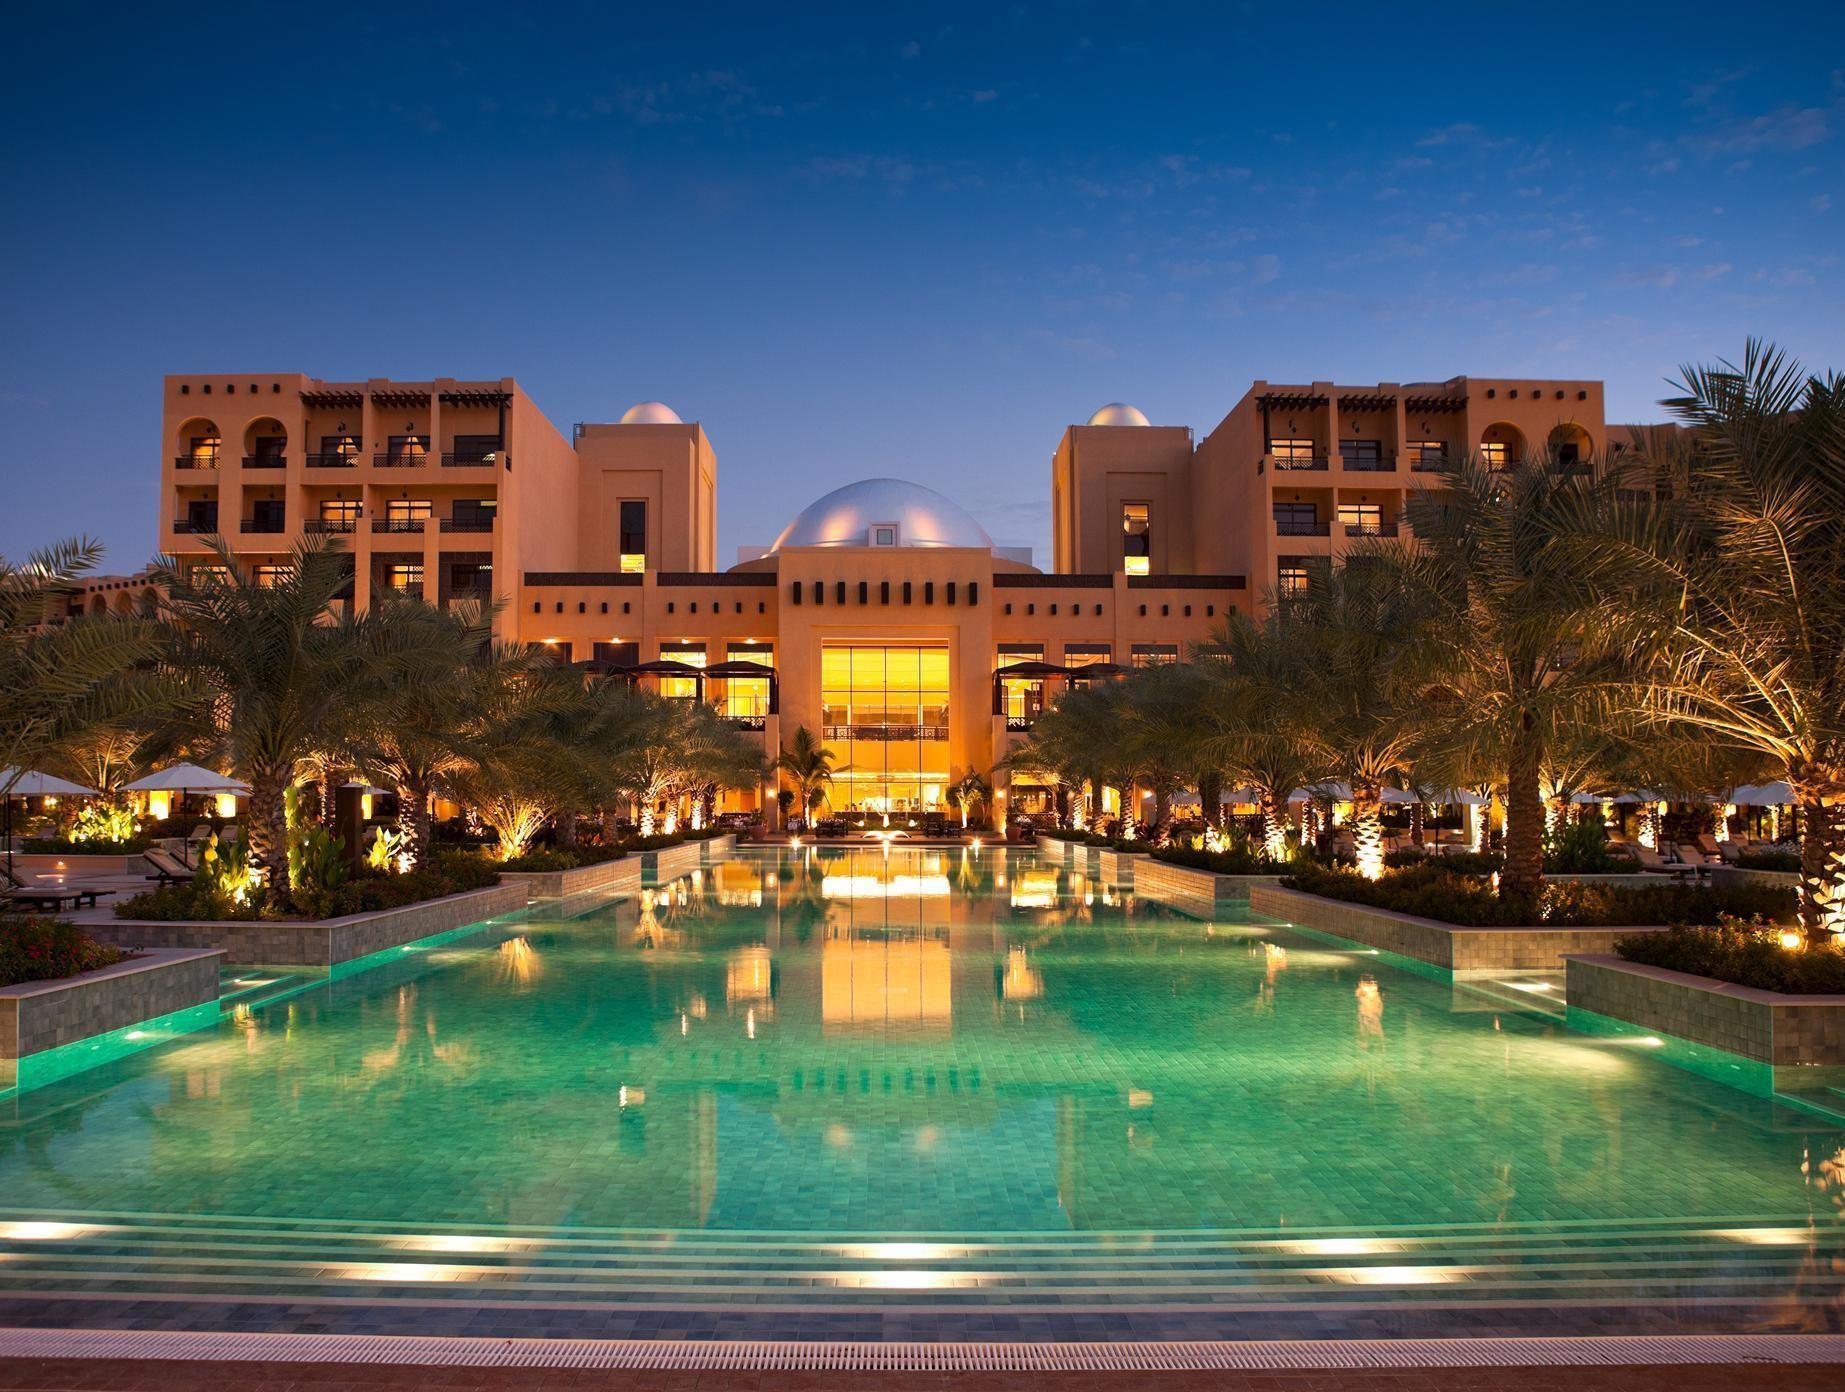 Ras Al Khaimah Hilton Ras Al Khaimah Resort Spa United Arab Emirates Middle East Hilton Ras Al Khaimah Resort Spa Is A Popu Best Resorts Resort Spa Resort